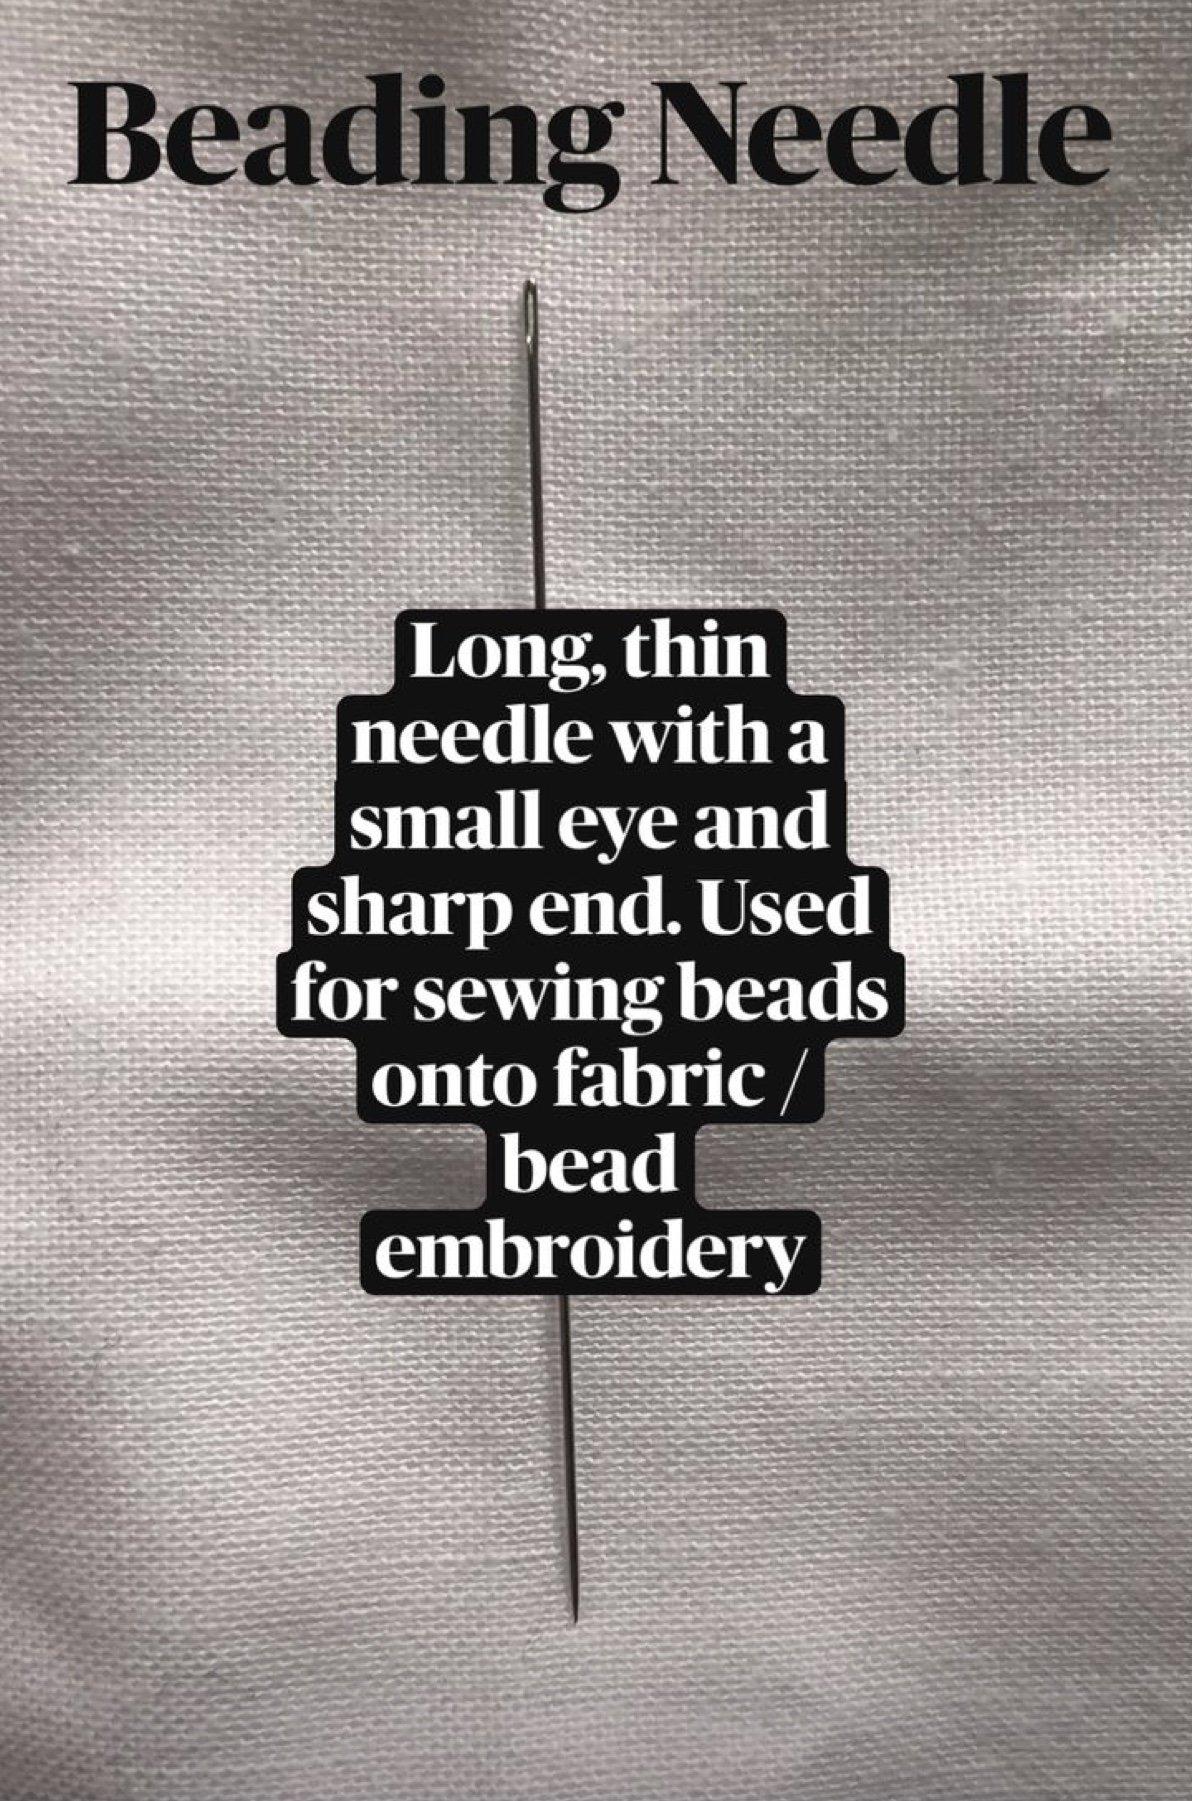 beading needle